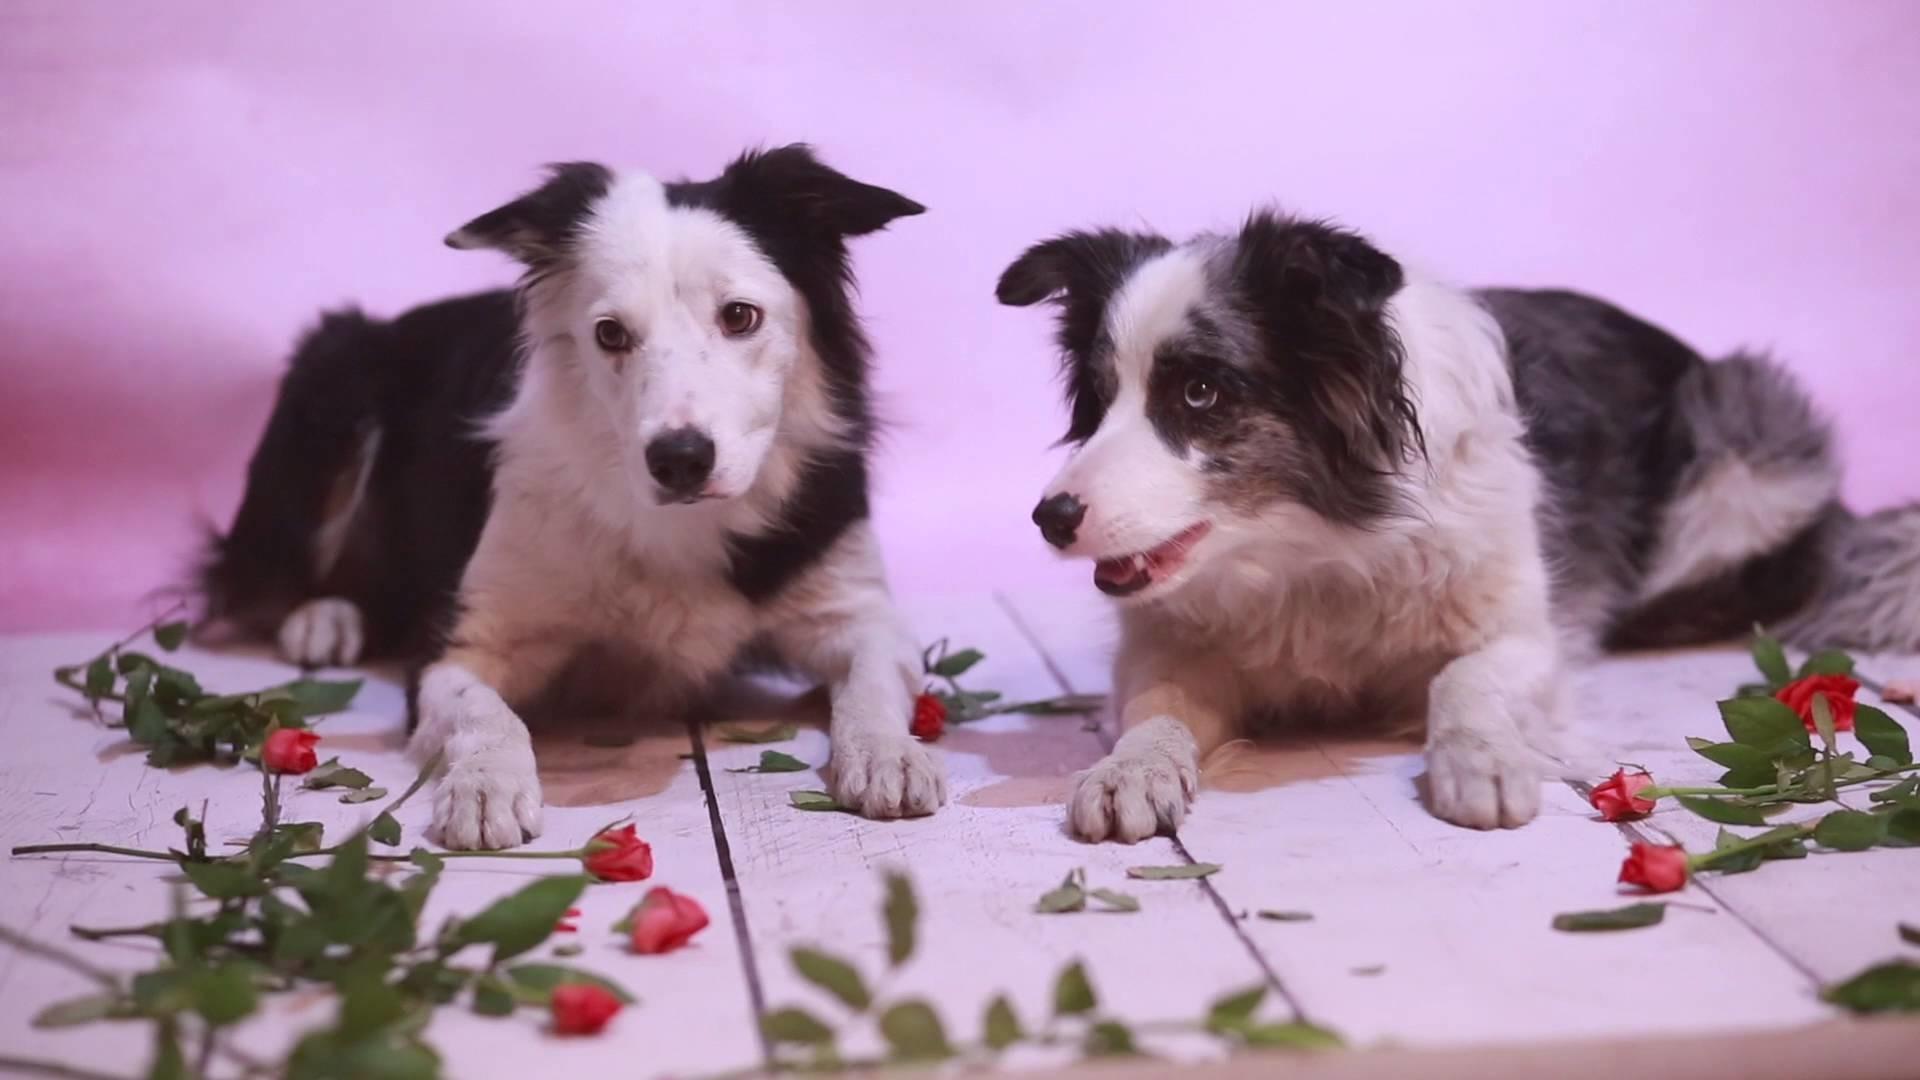 MADzone border collies :: Zoe, Madlene & Sorin – Happy Valentine's Day!